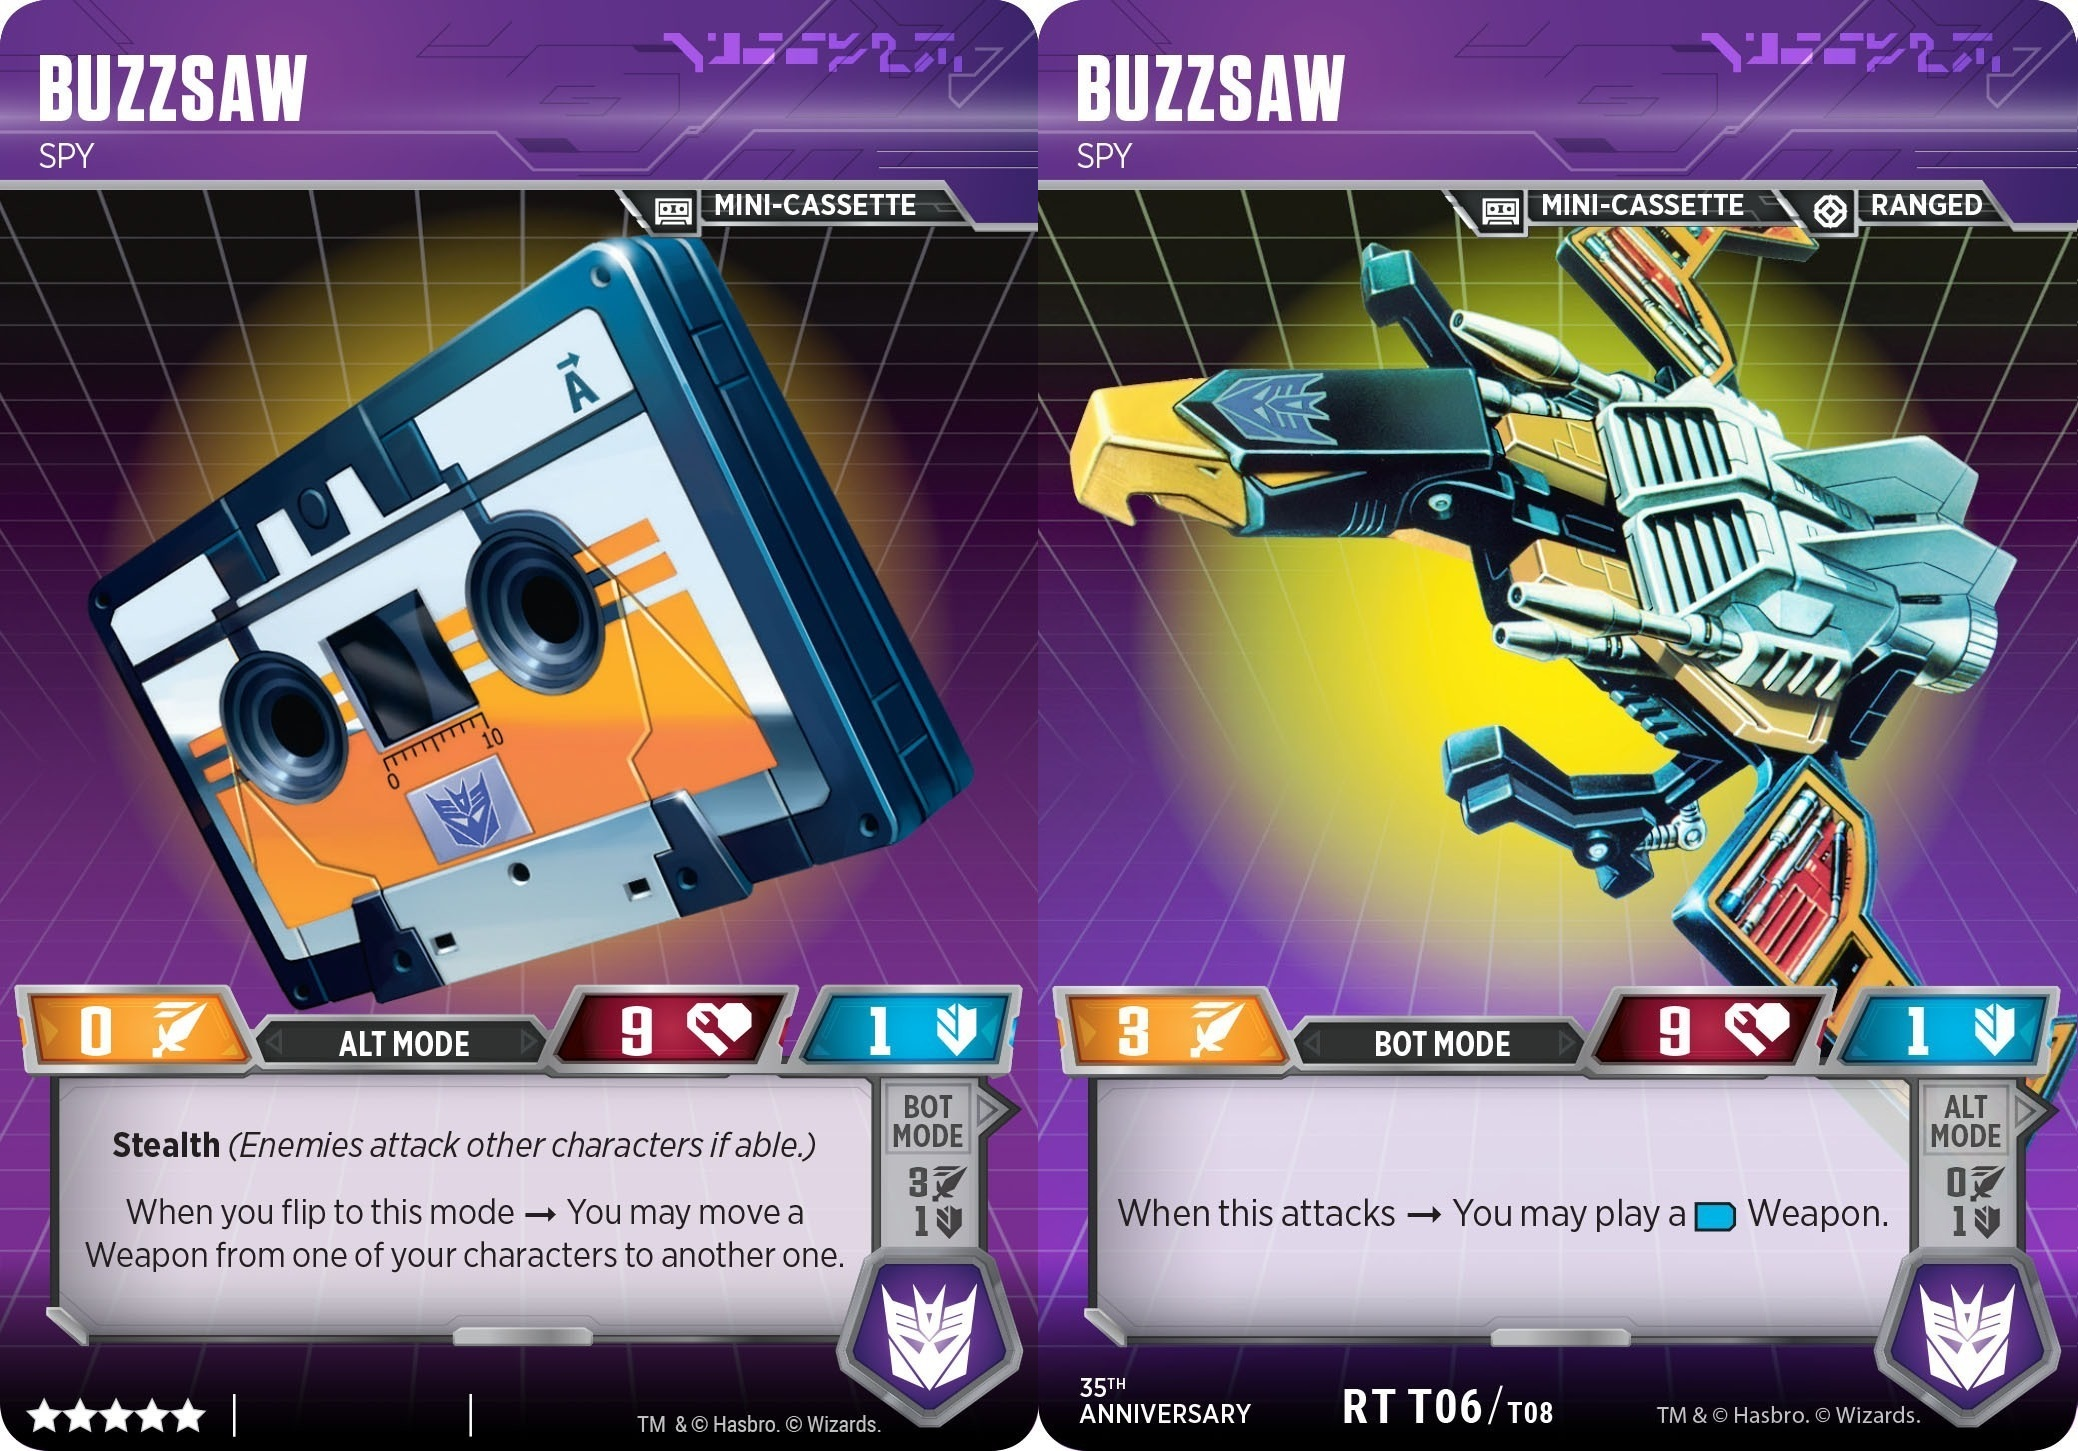 Buzzsaw // Spy (35th Anniversary)